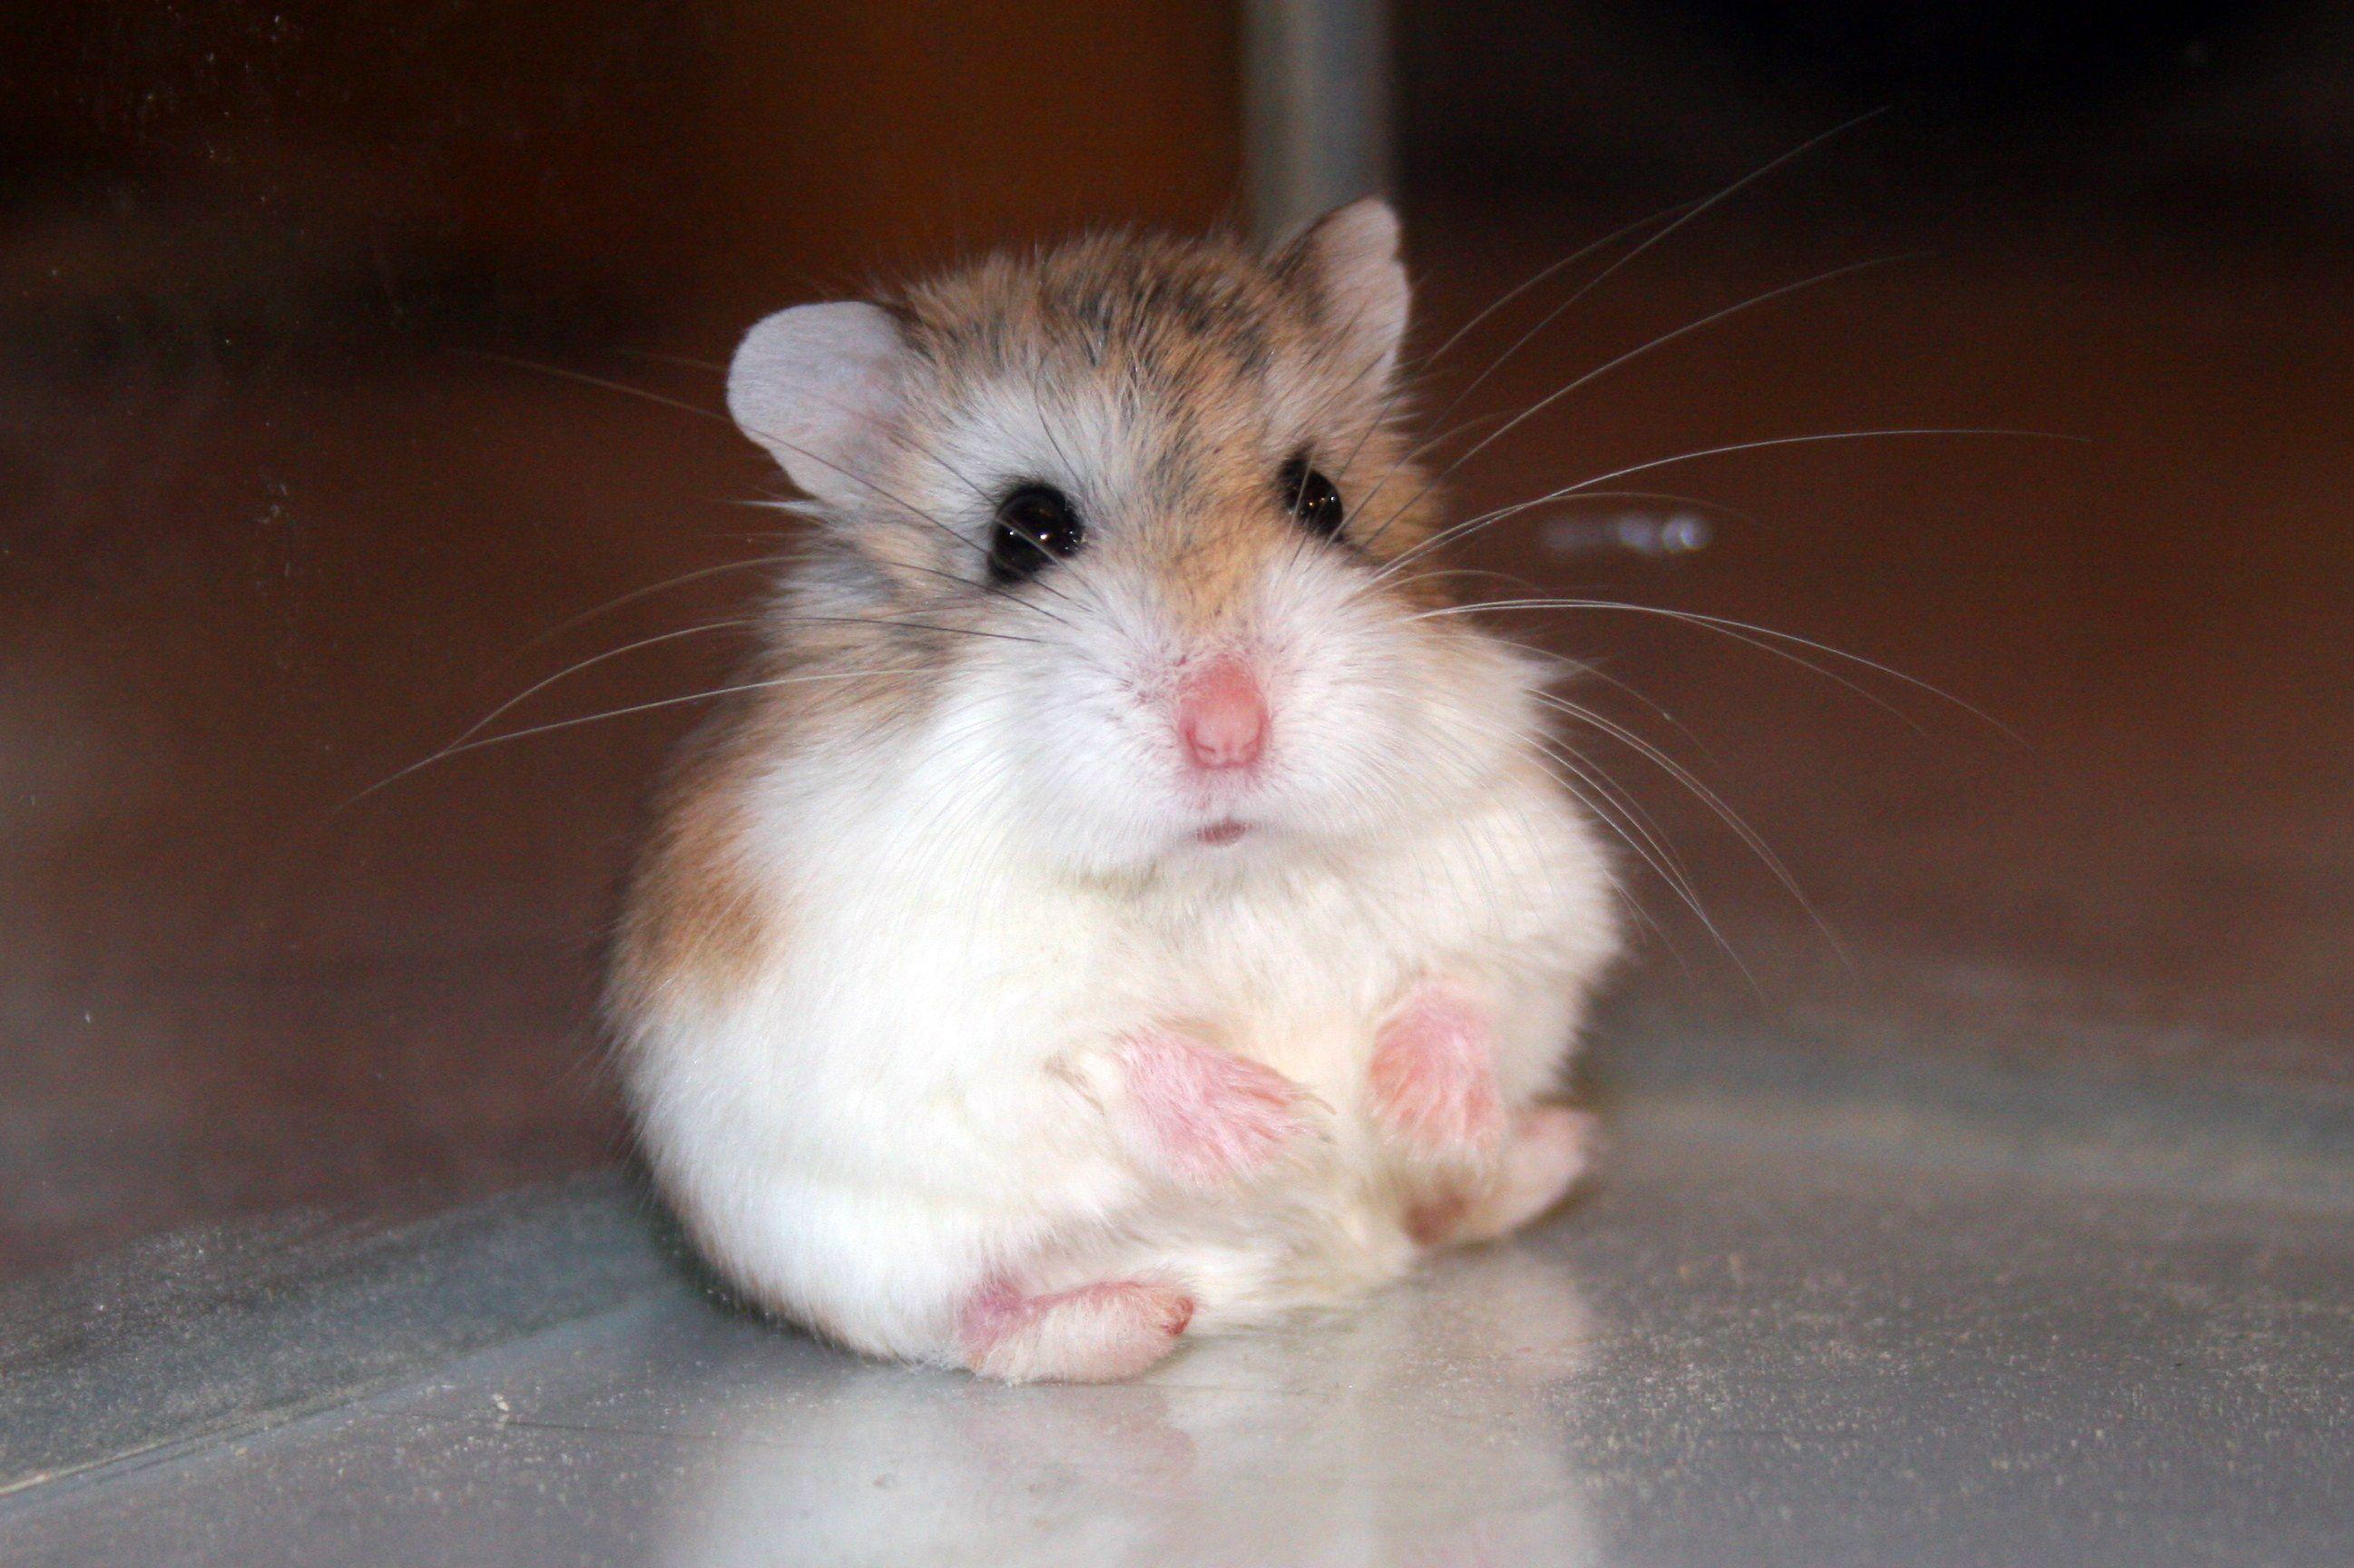 Pin Von Nif Auf Cute Hamster Susse Tiere Tiere Haustiere